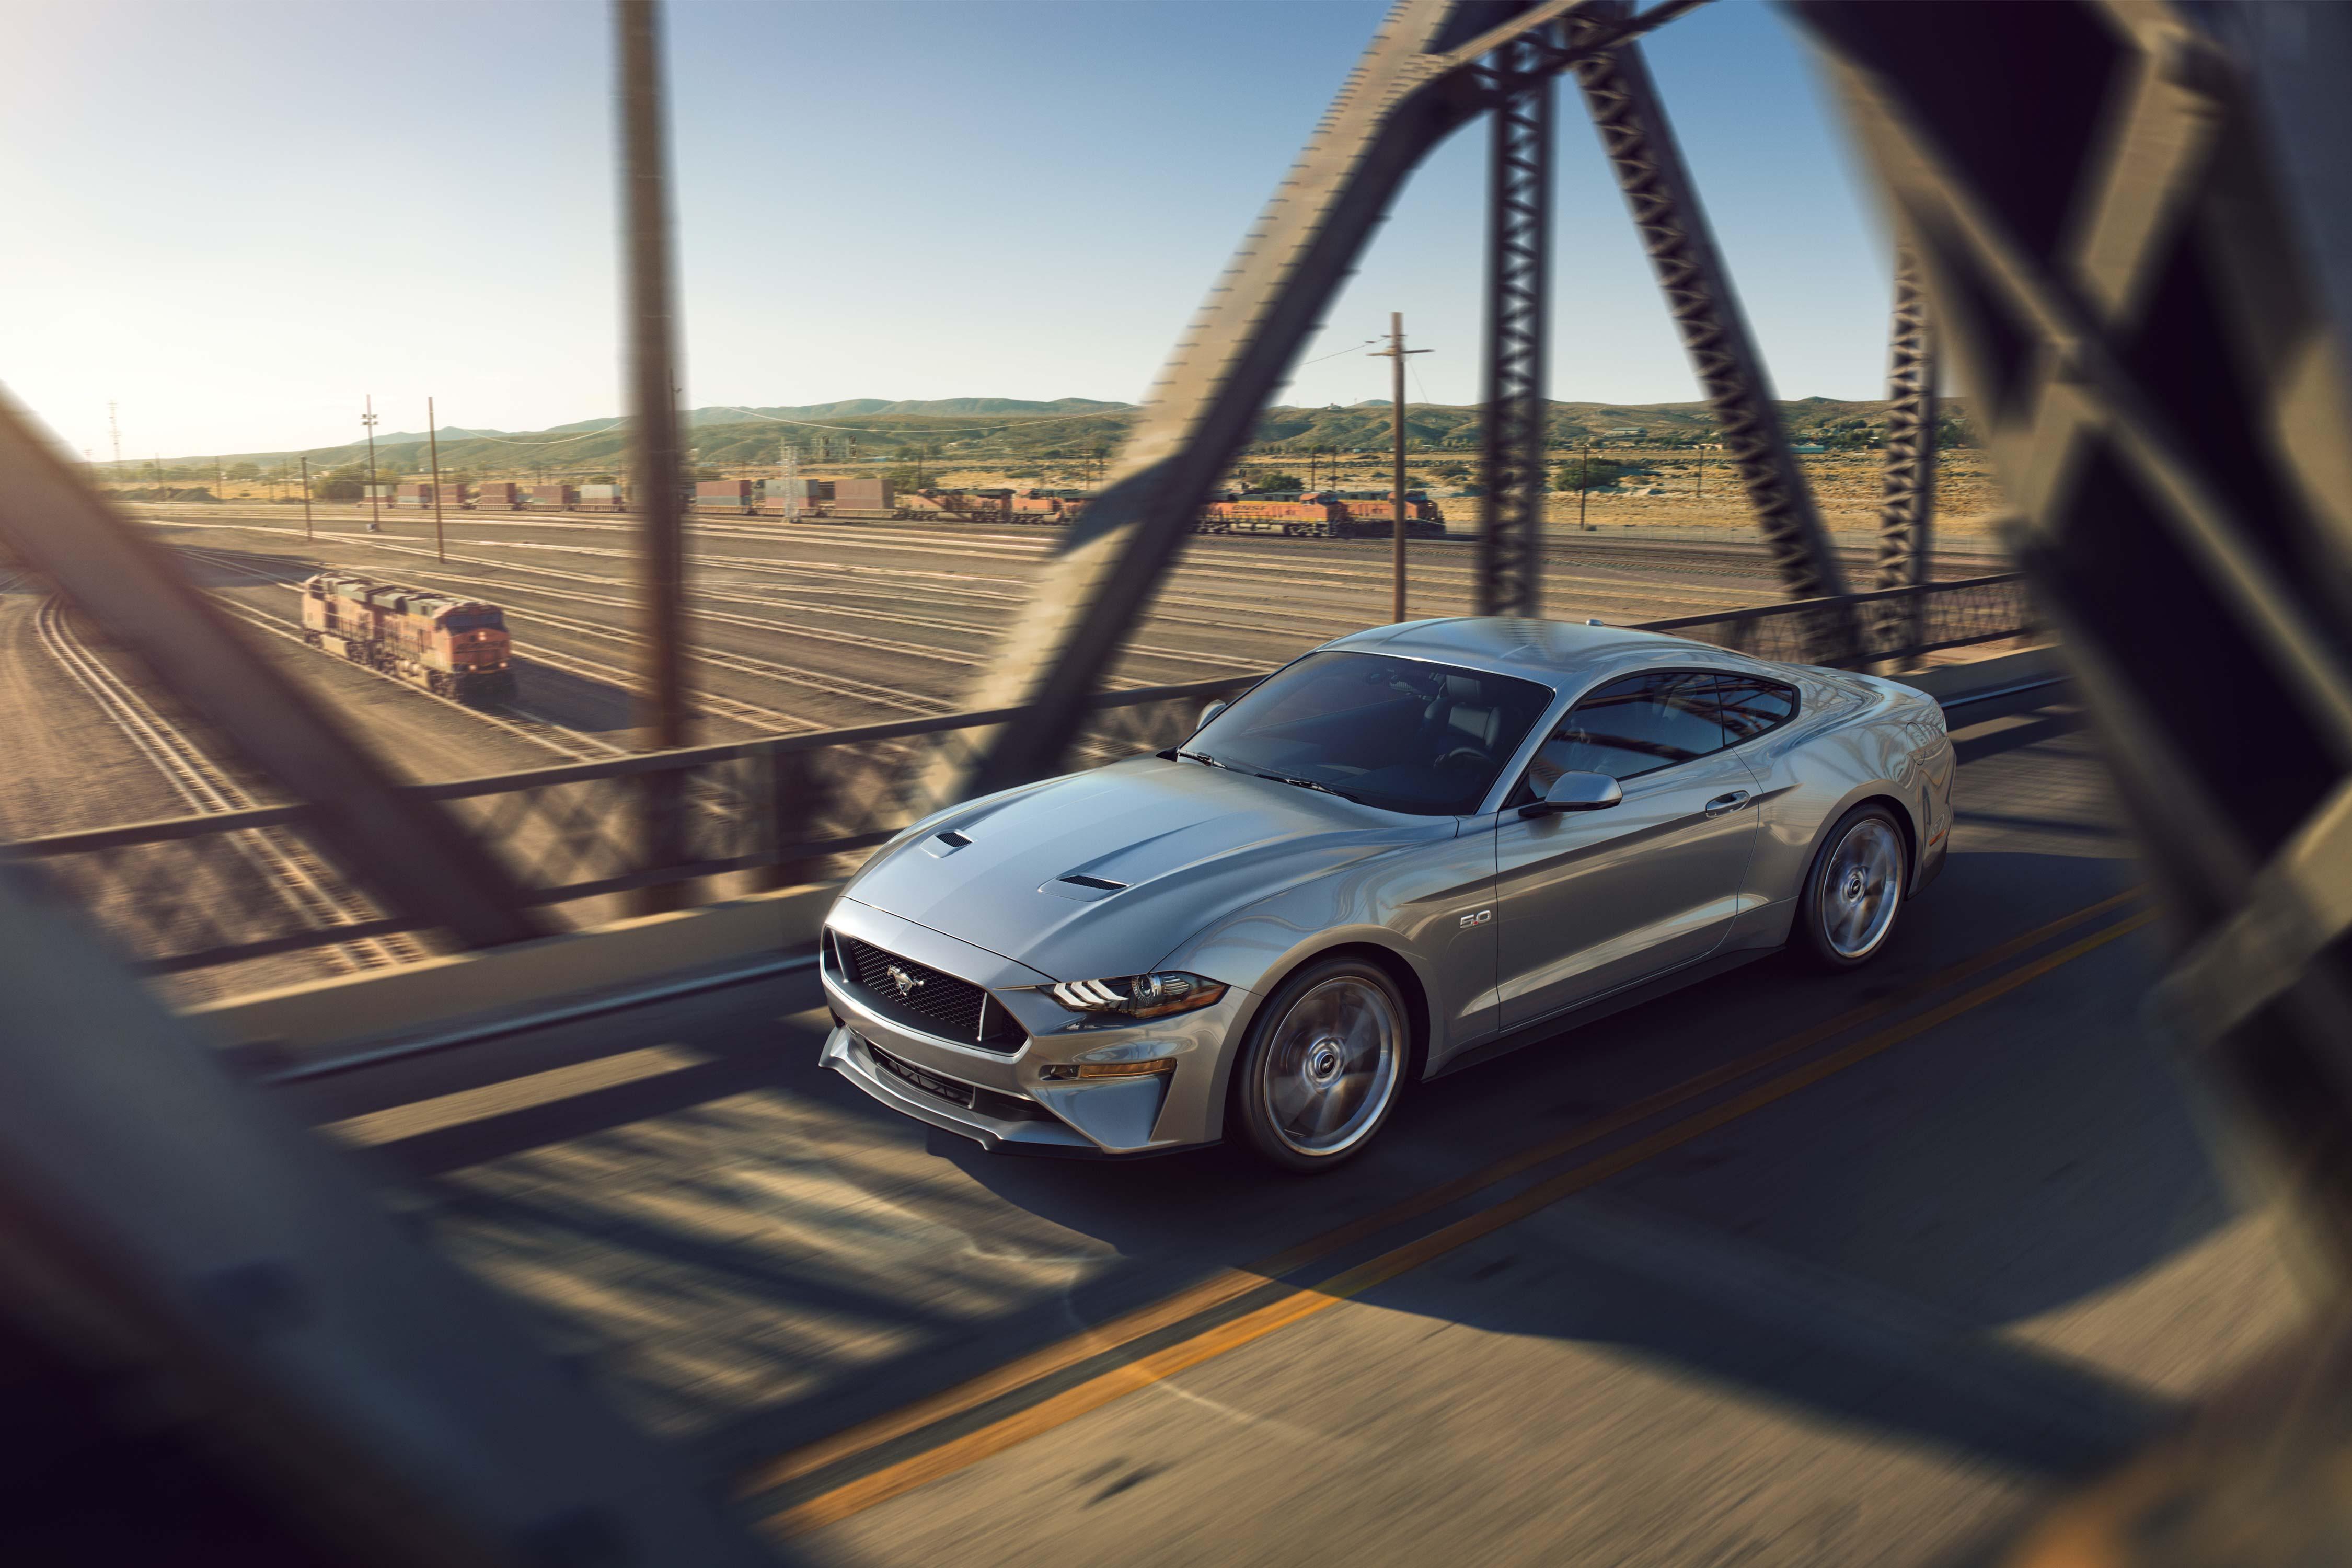 Best Ford Mustang Gt Desktop Wallpaper Download 2018 Ford